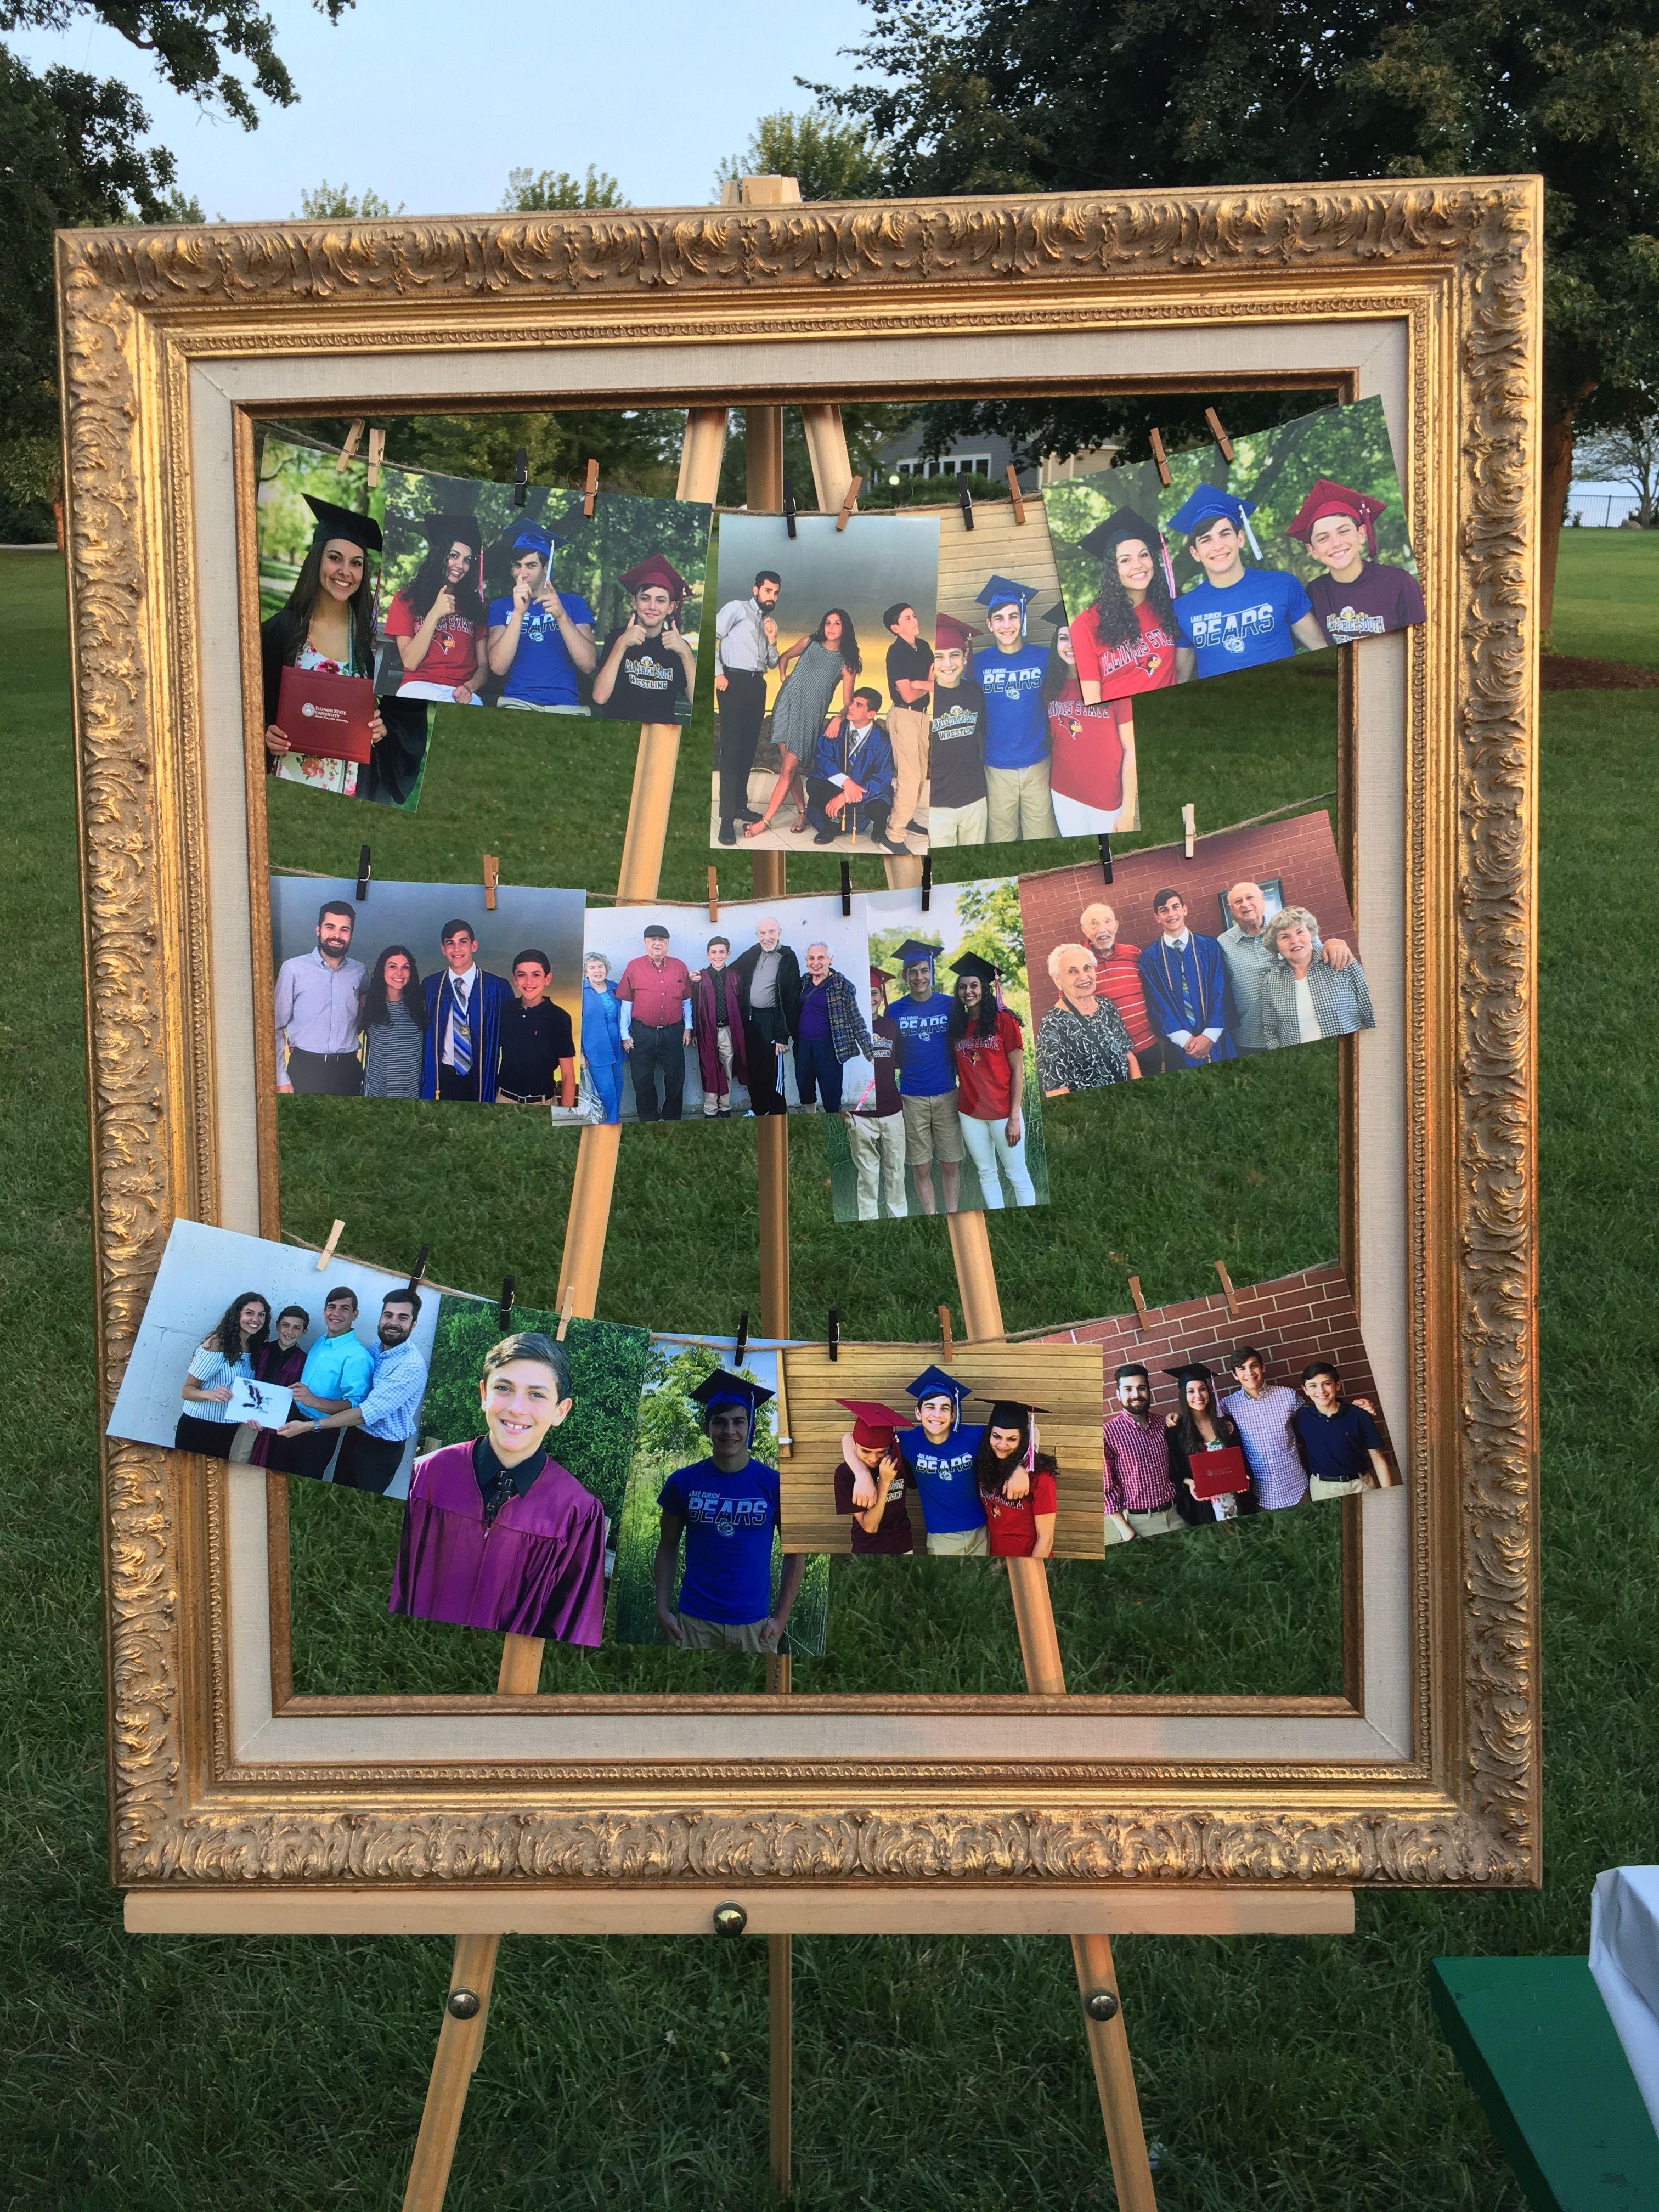 Pin by Ann Wayne on graduation | Decor, Home decor, Frame